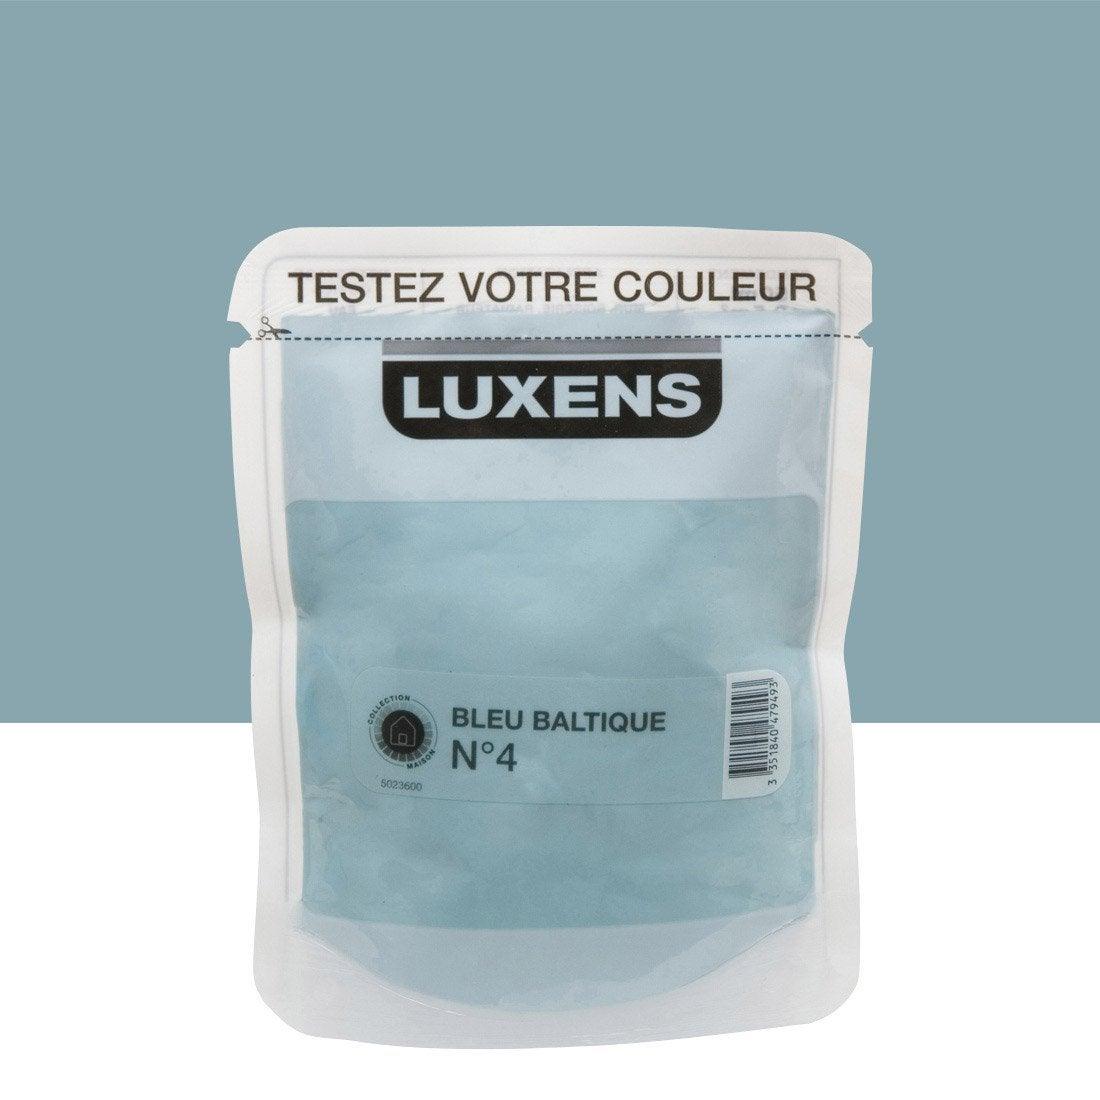 Salon Bleu Baltique : Testeur peinture bleu baltique luxens couleurs